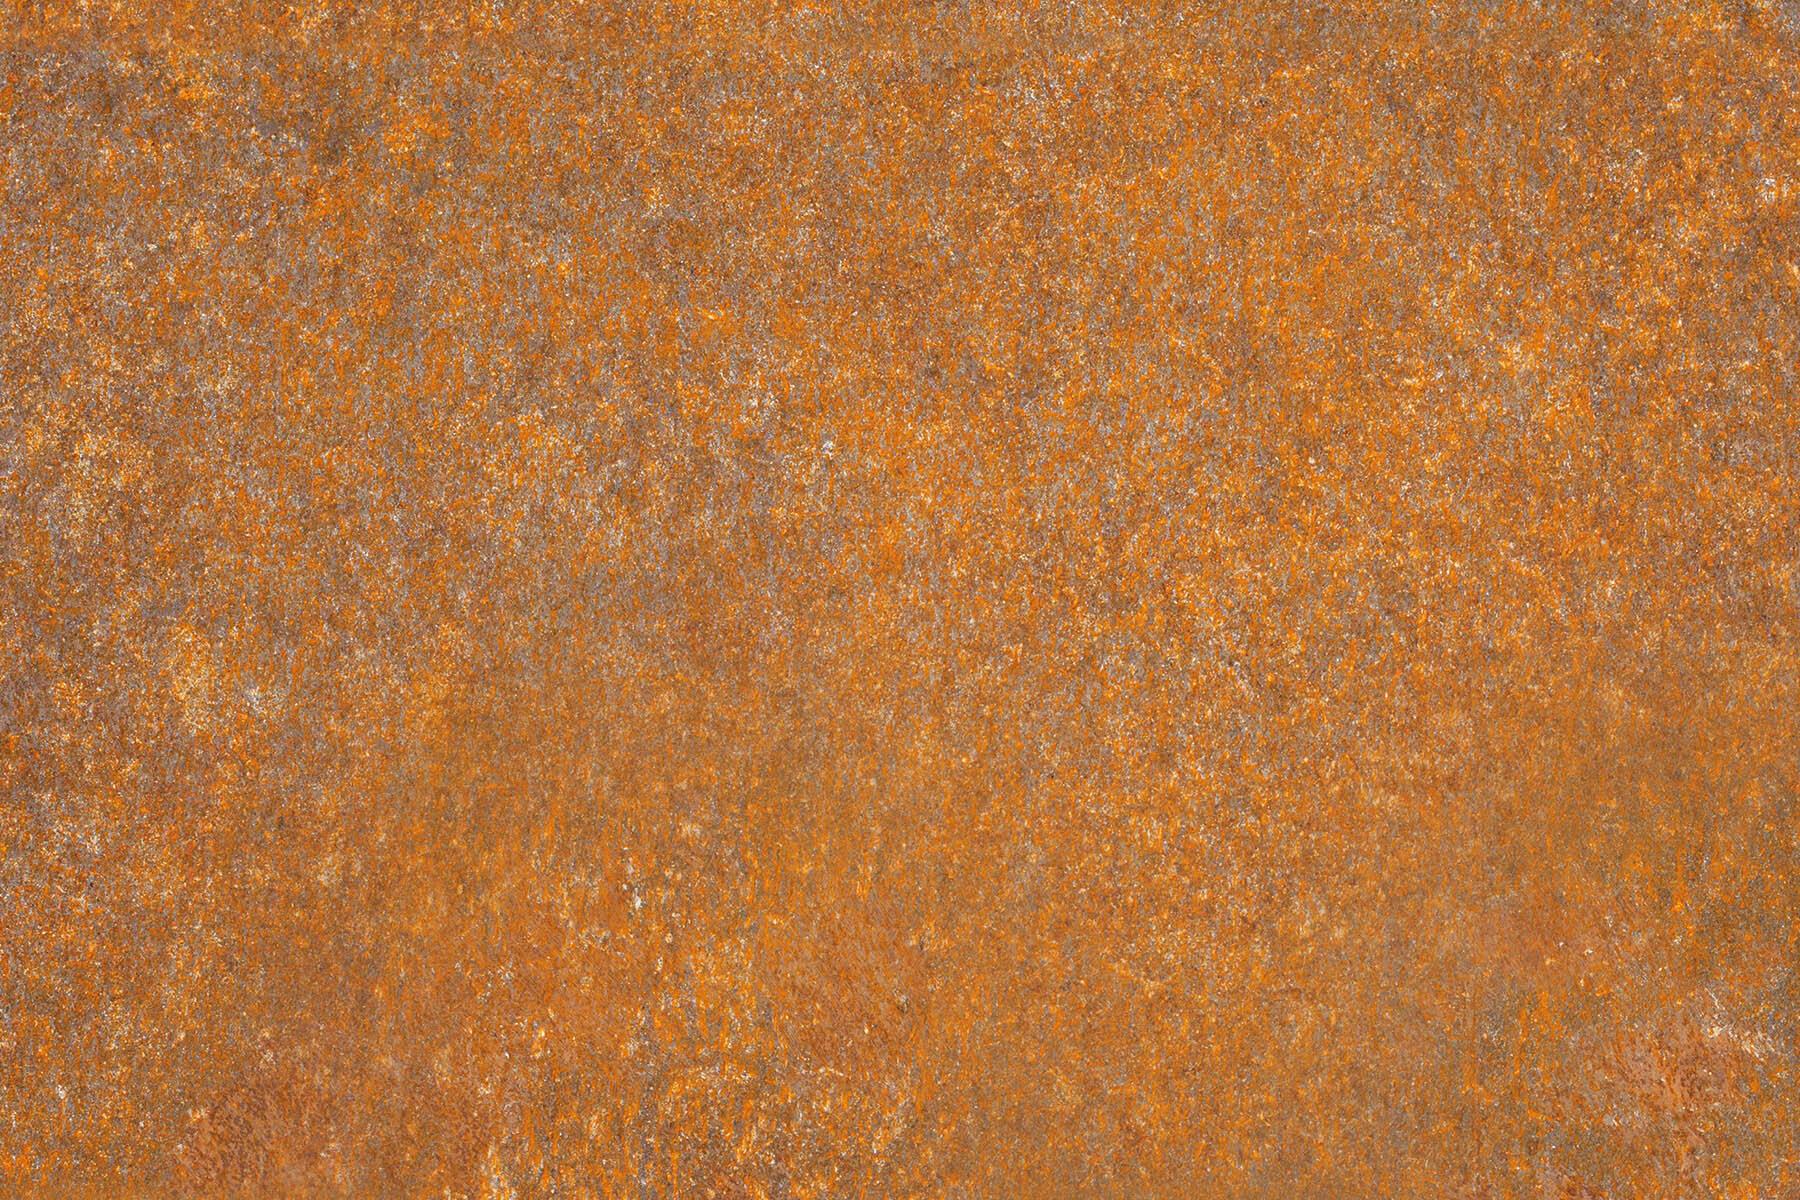 PlateART Duschrückwand mit Motiv Rost